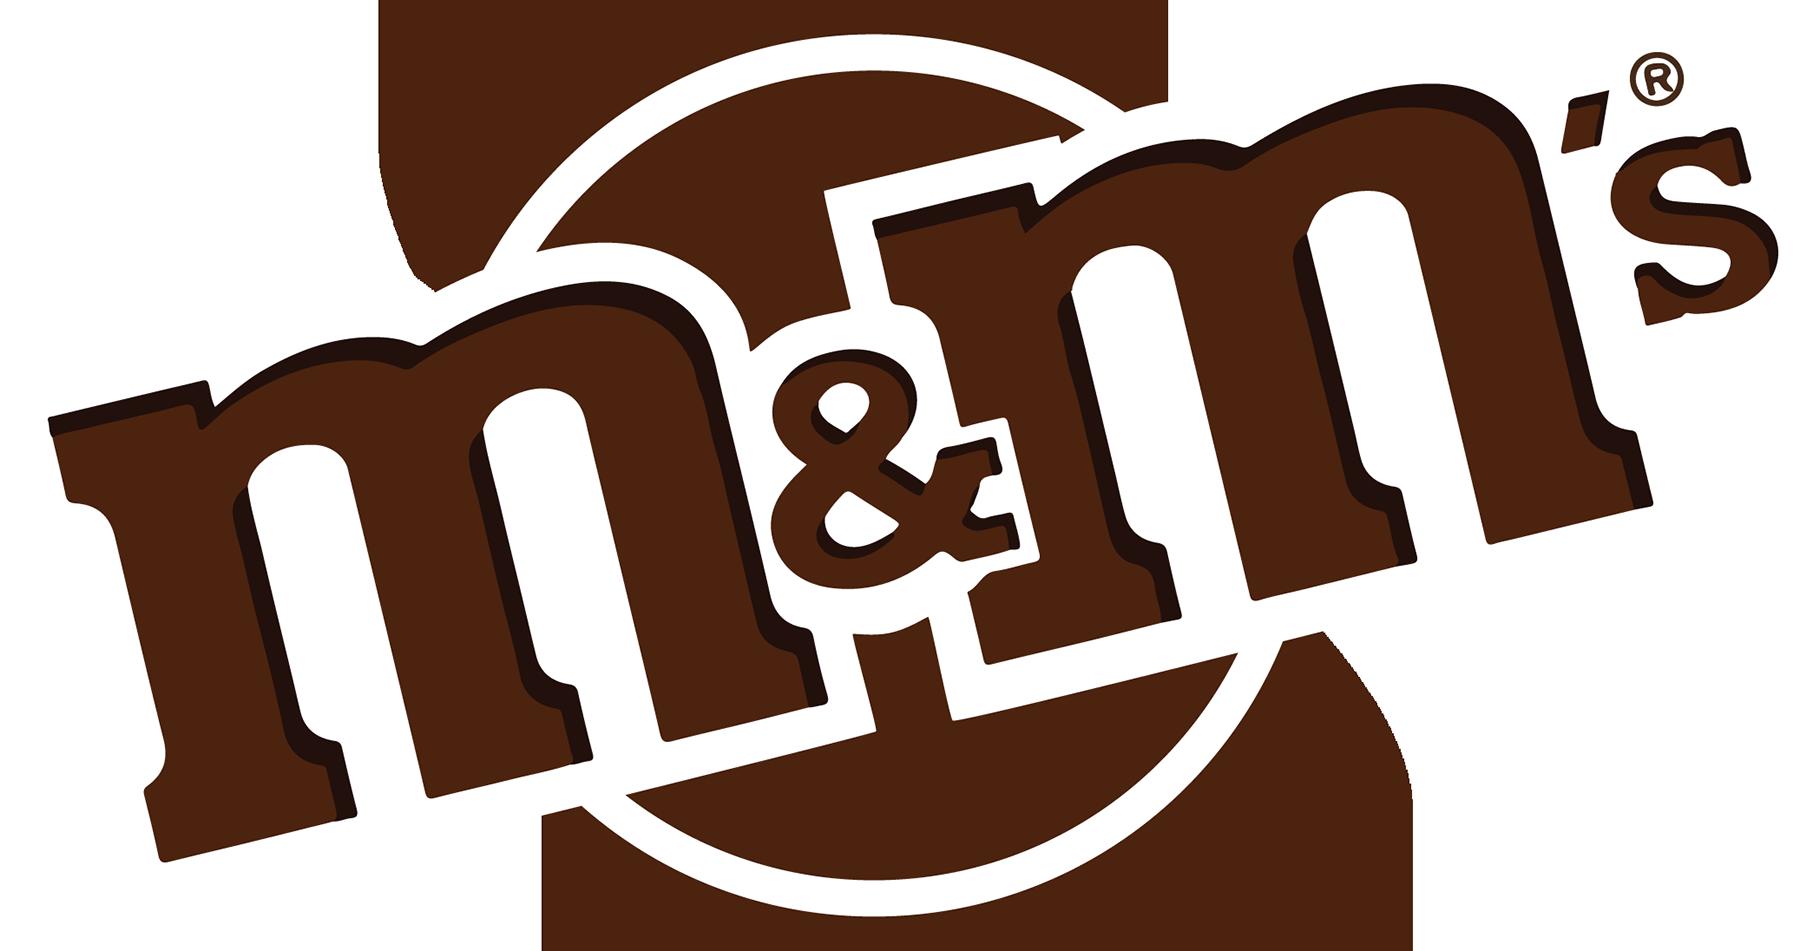 M&M's логотип PNG